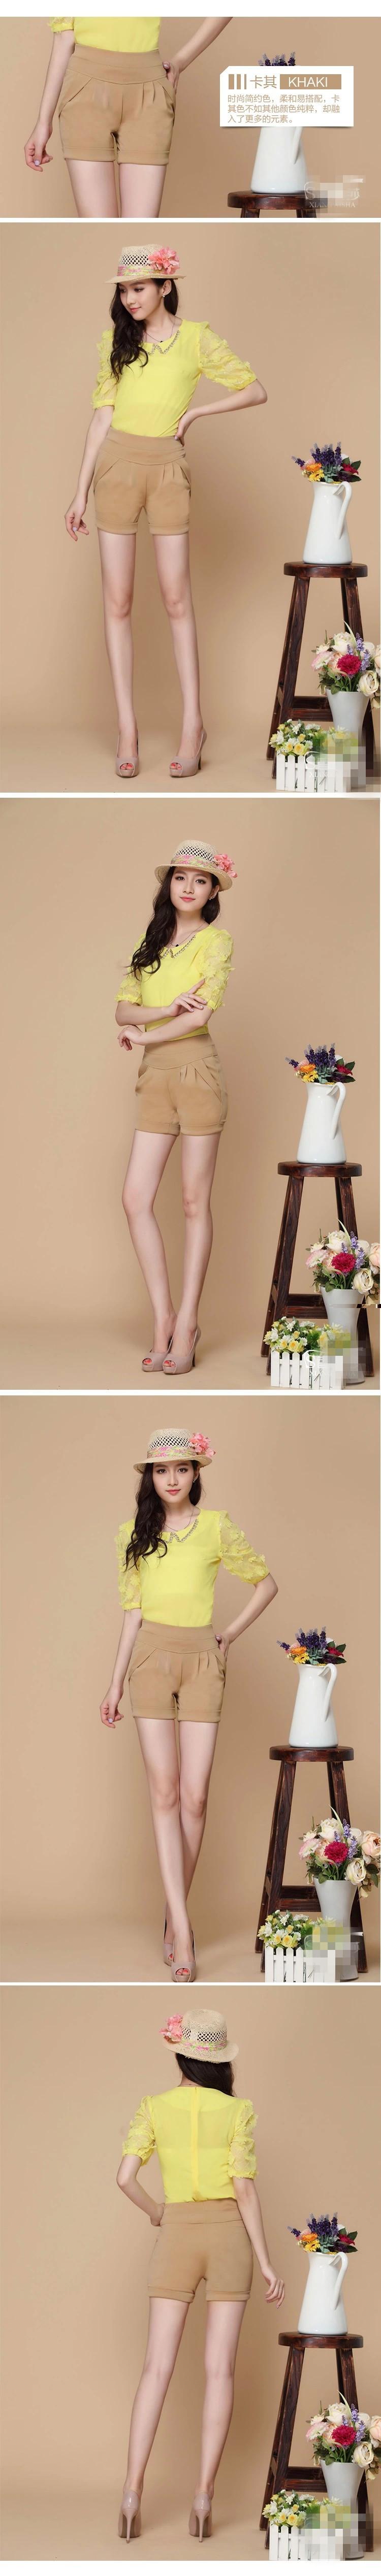 17 Summer Stretch Shorts Women Casual High Waist Shorts for Female Fat Plus Size Woman Clothing Beach Women's cotton Shorts 7